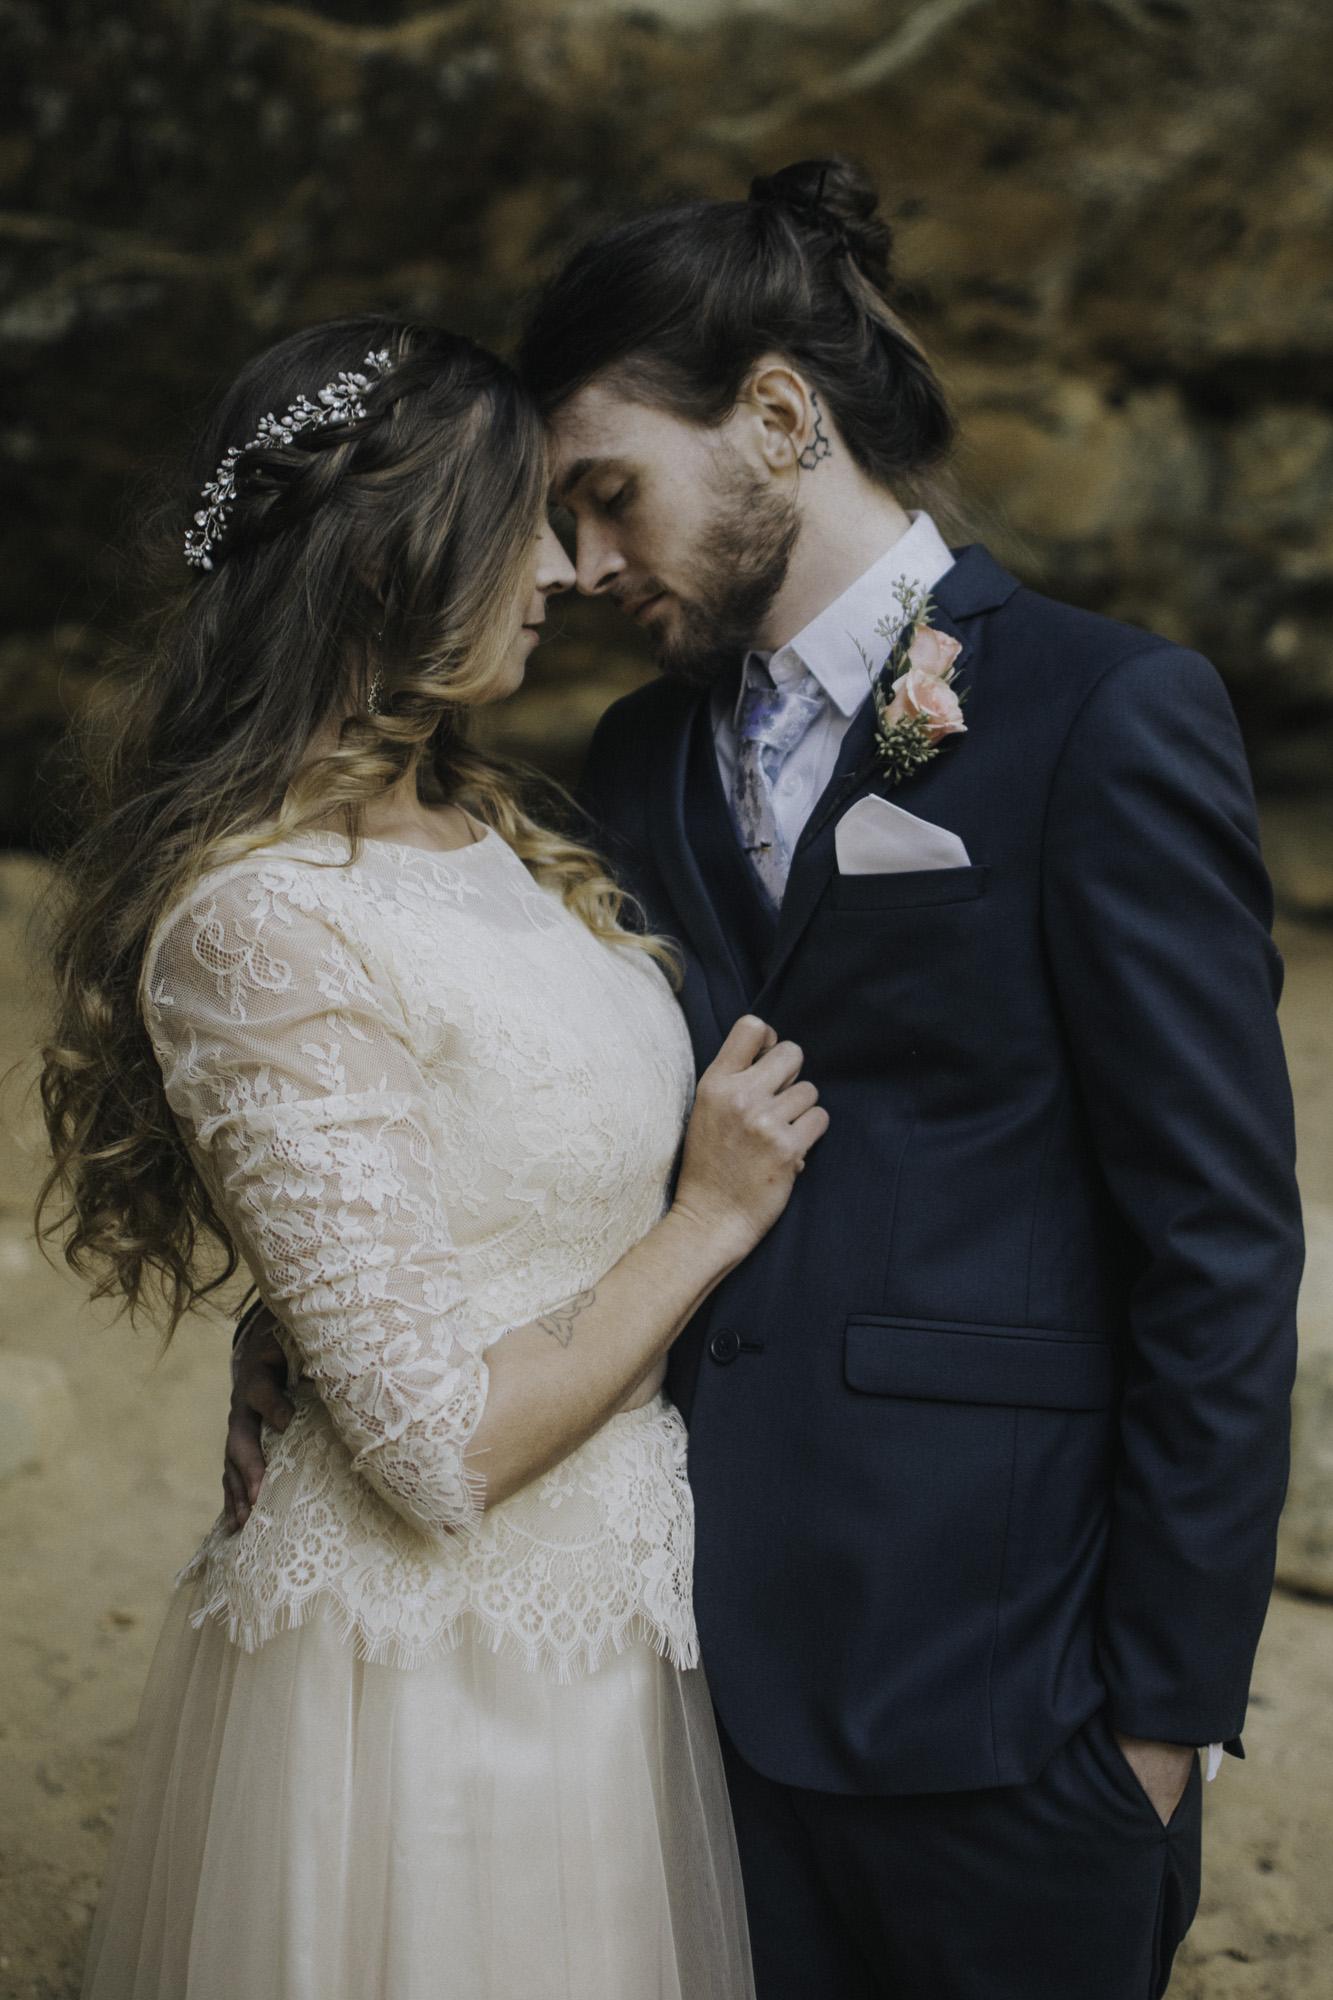 Cate_Ann_Photography_Dayton_Ohio_Wedding_Elopement_And_Engagement_PhotographerDSC_5957.jpg